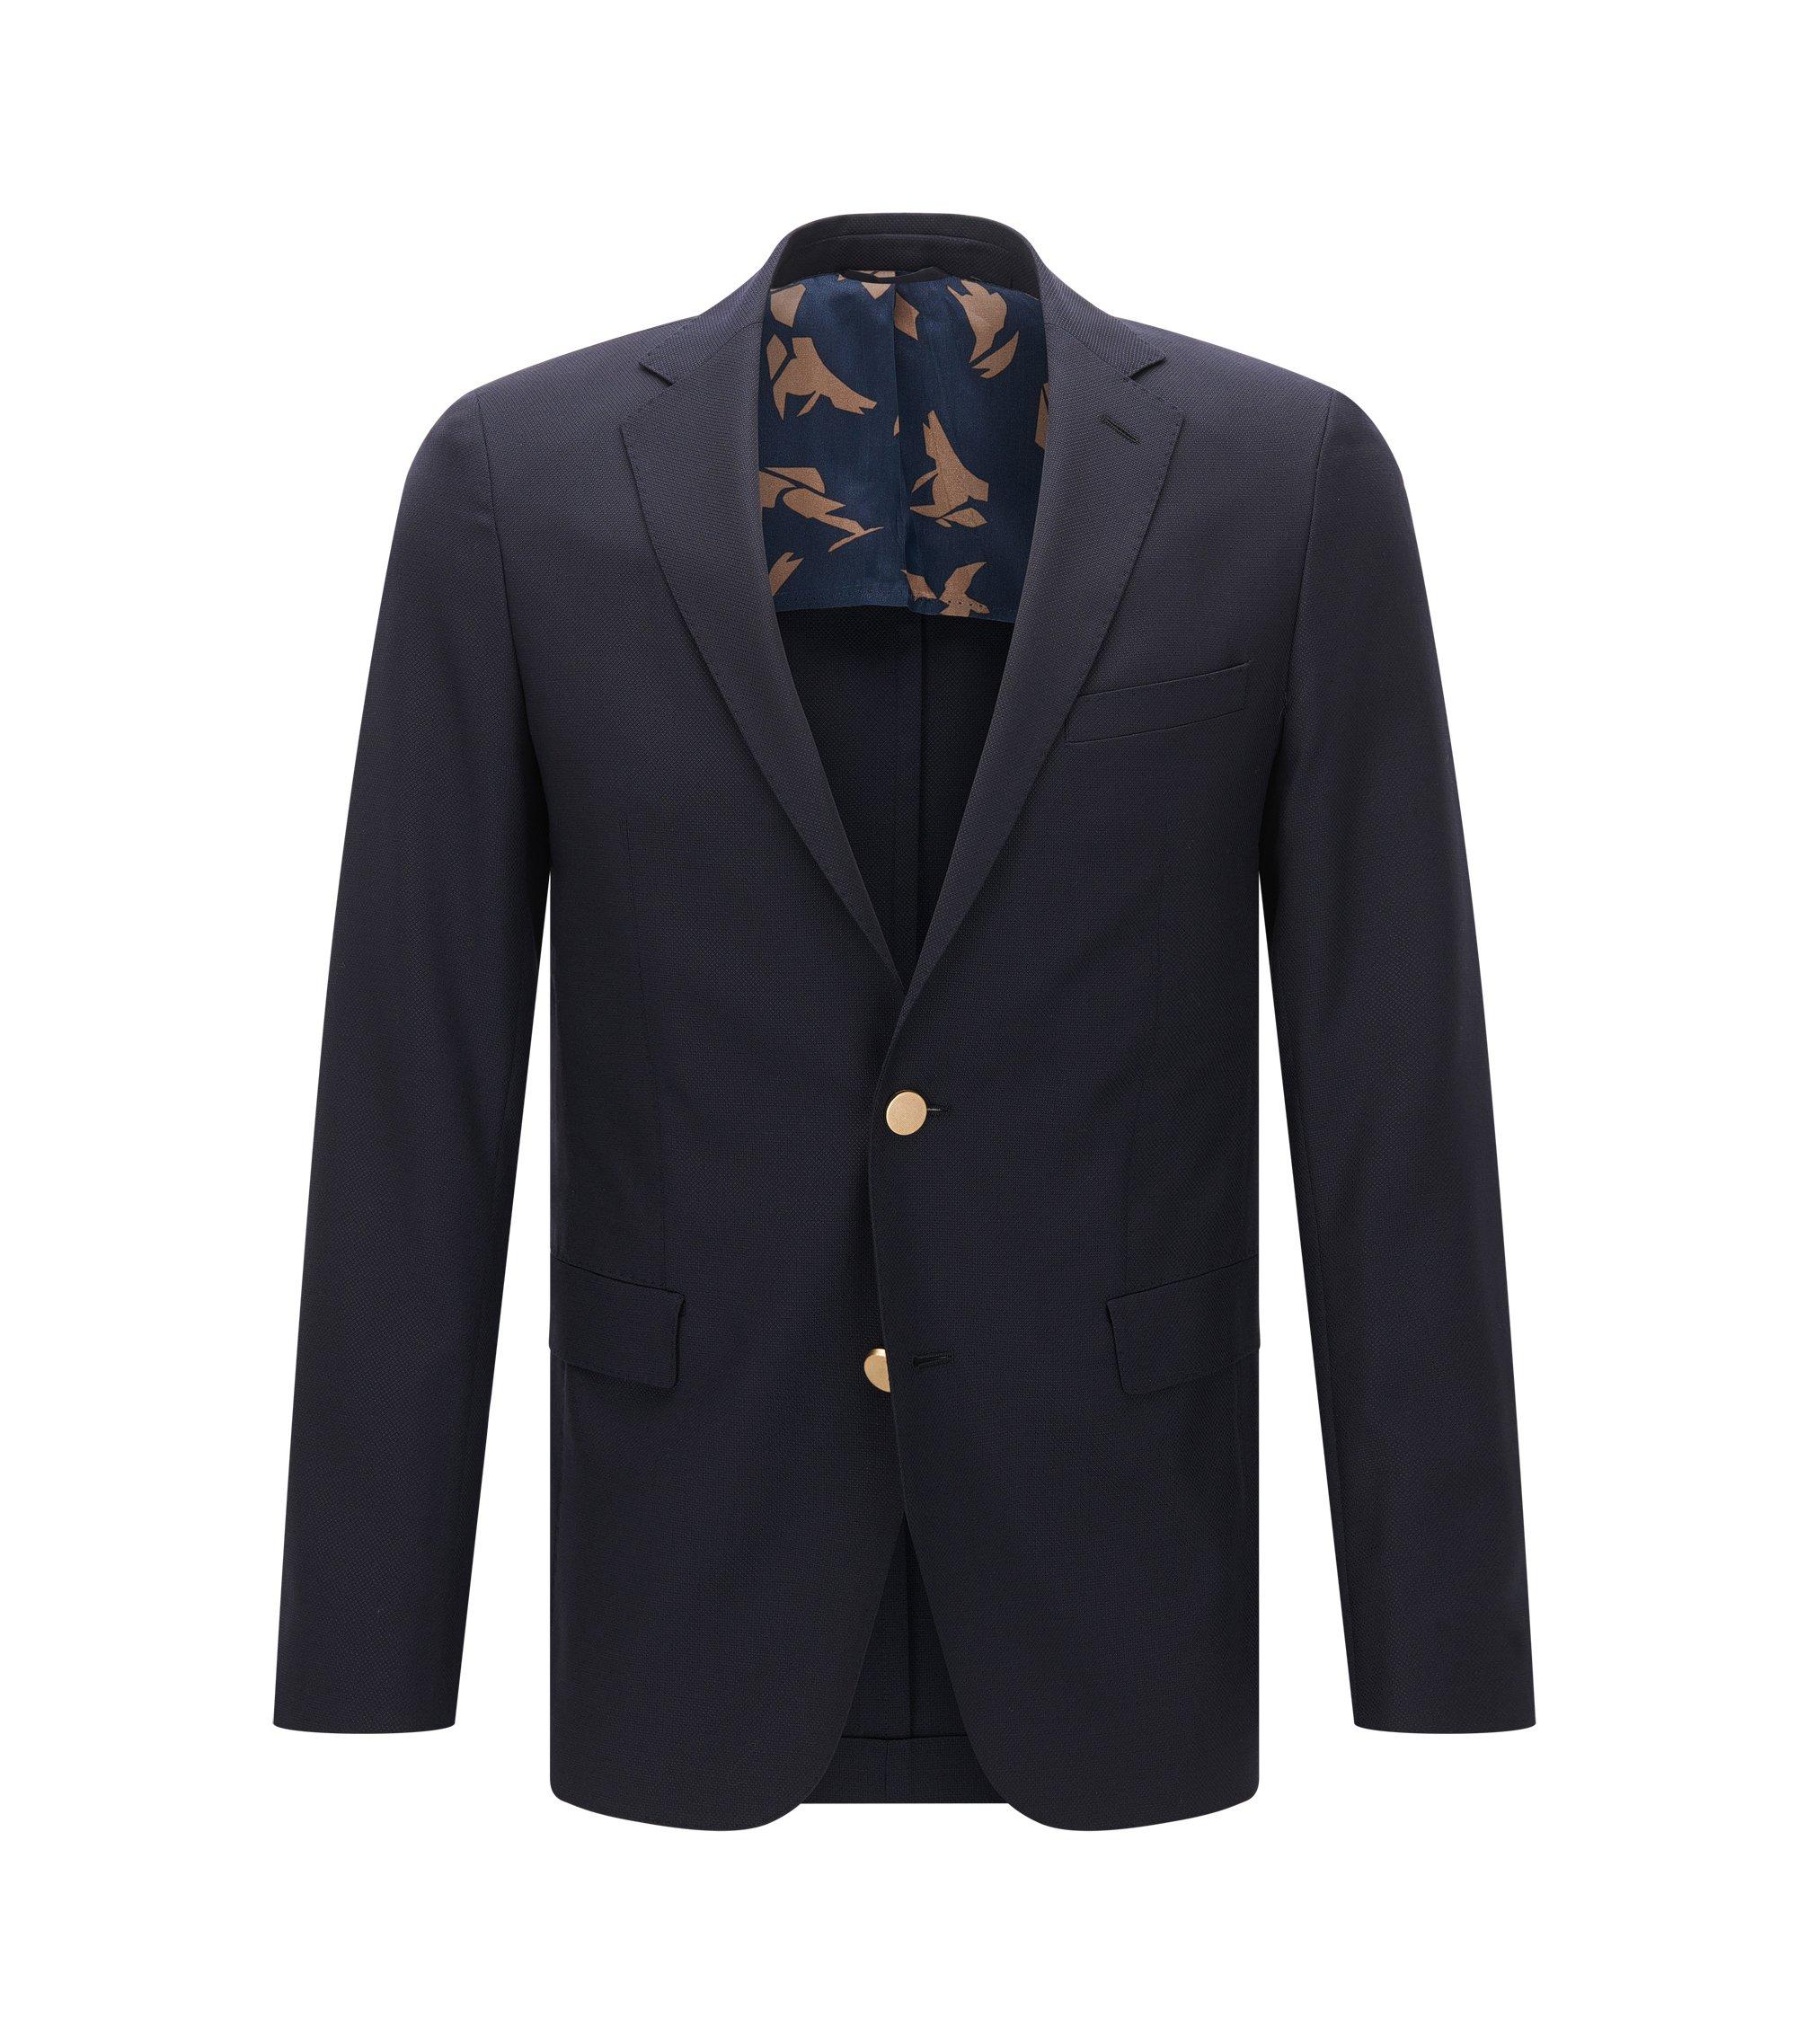 Giacca extra slim fit in lana vergine lavorata, Blu scuro